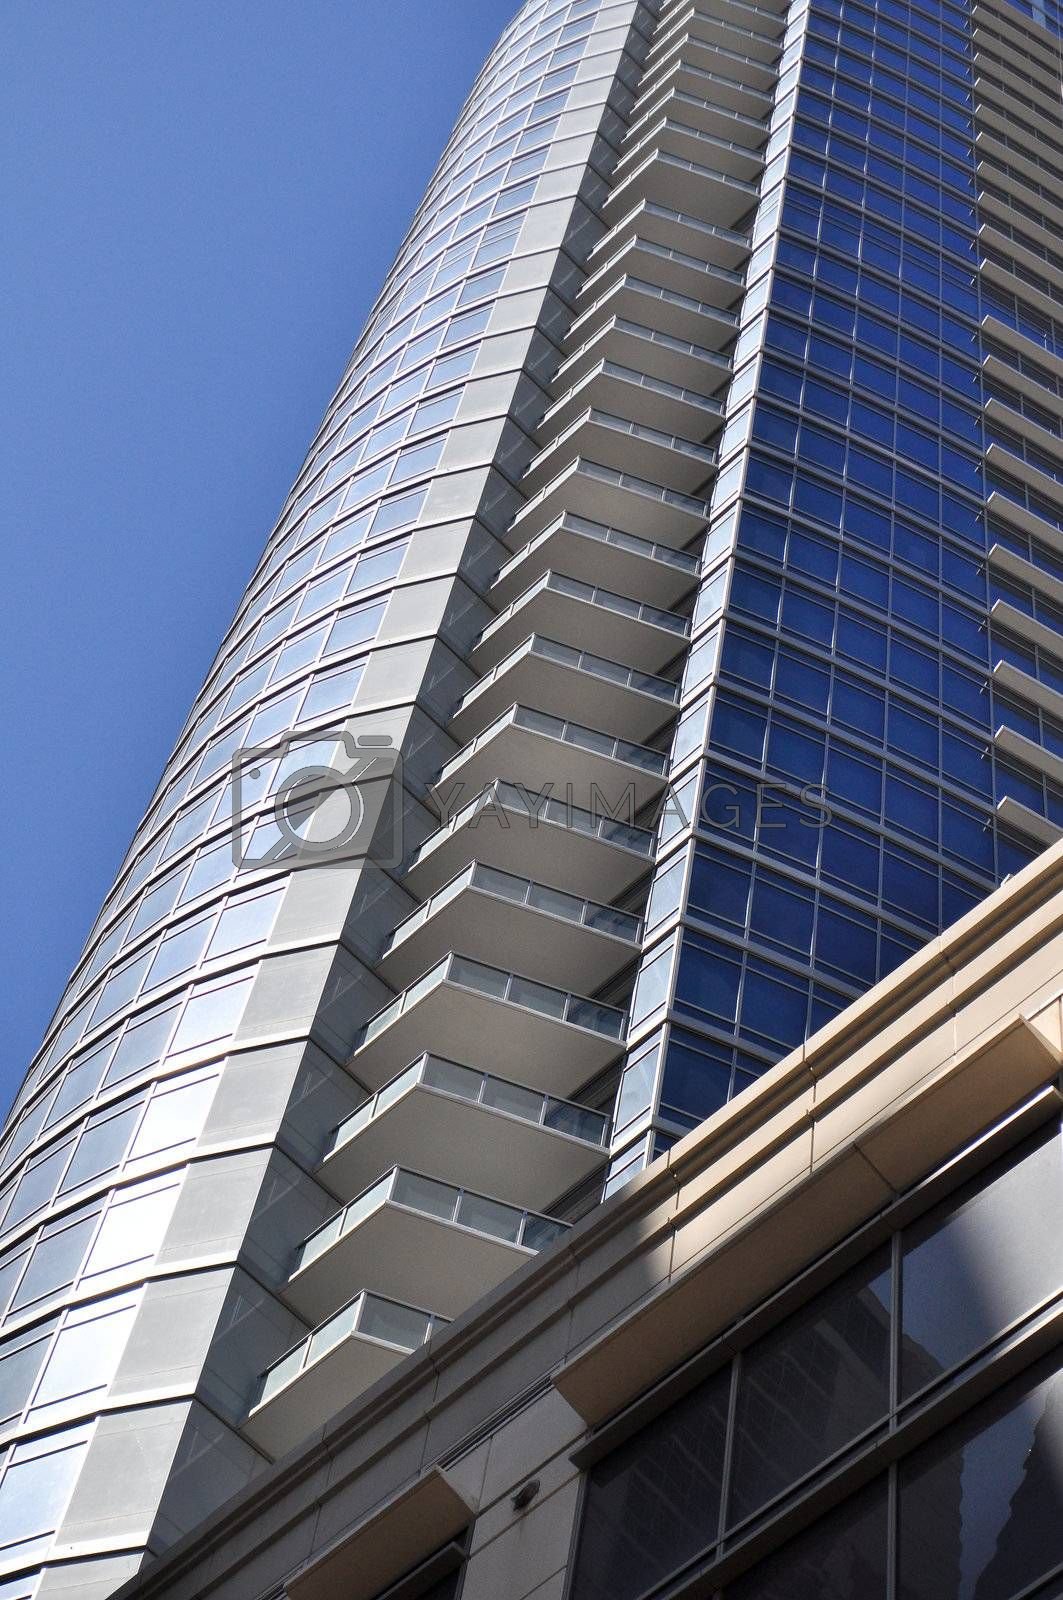 Austin Skyscraper Perspective by RefocusPhoto